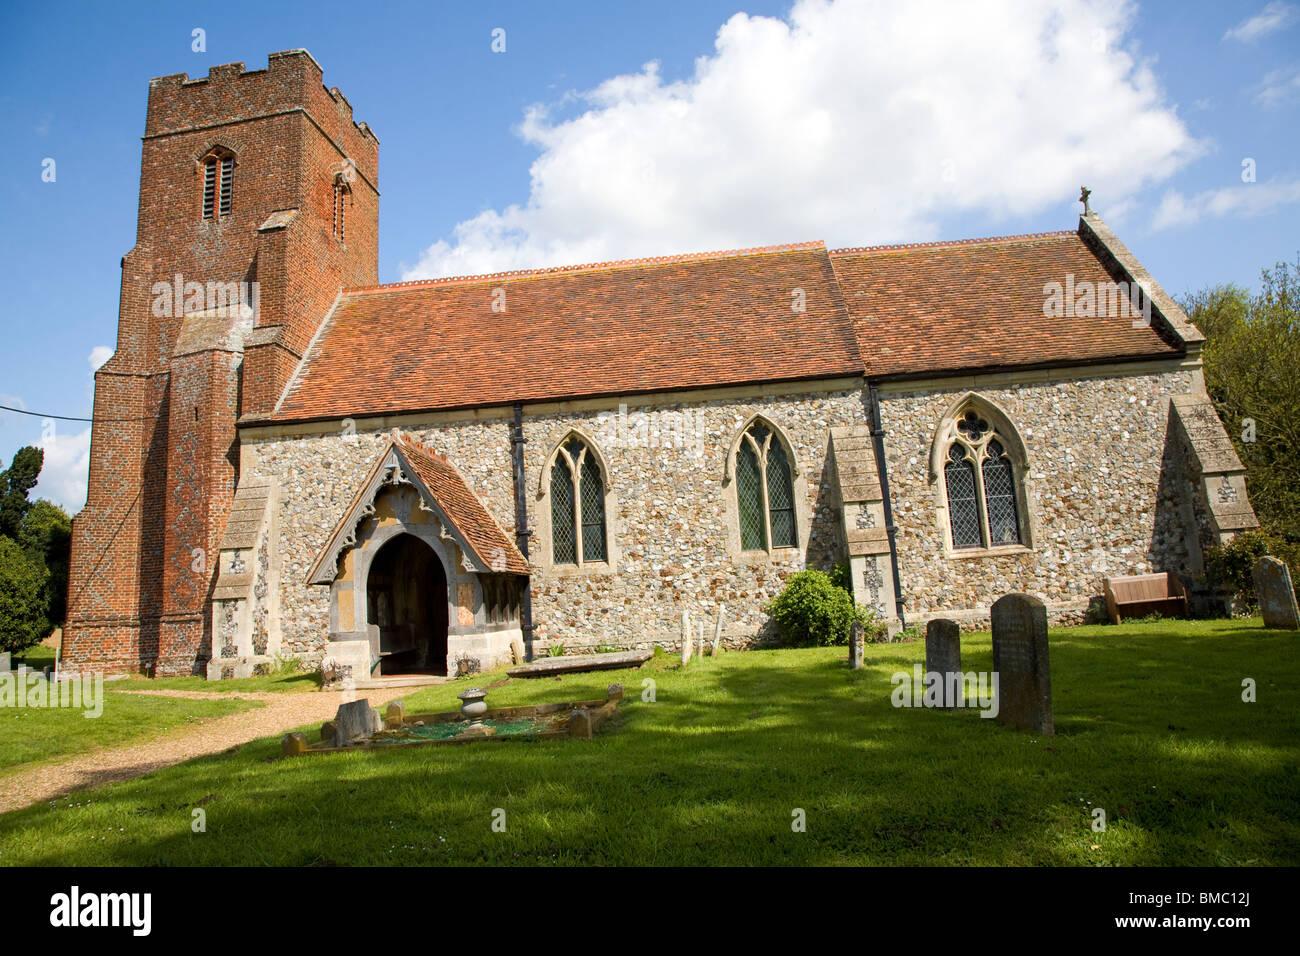 Church of All Saints, Hemley, Suffolk - Stock Image